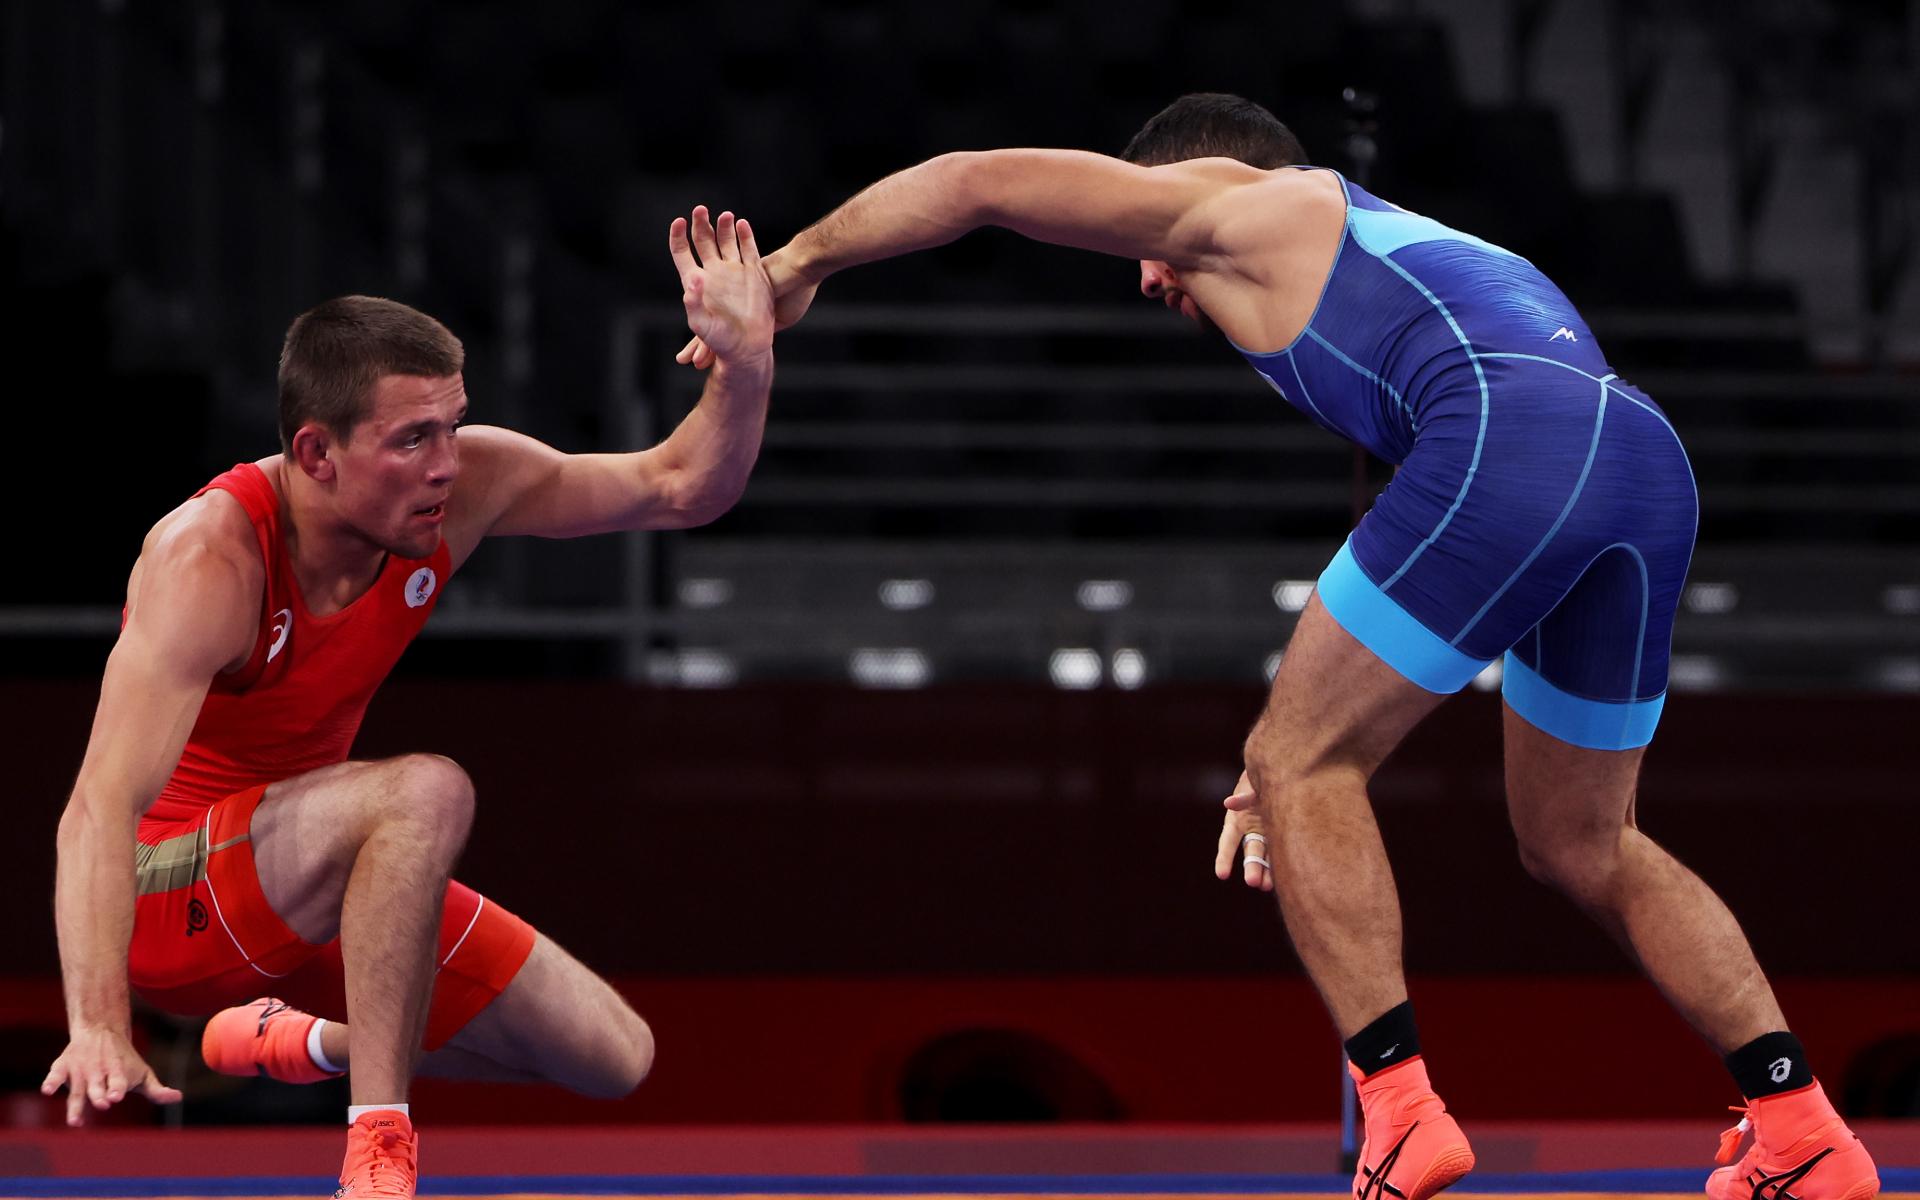 Фото: Артем Сурков справа (Getty Images)